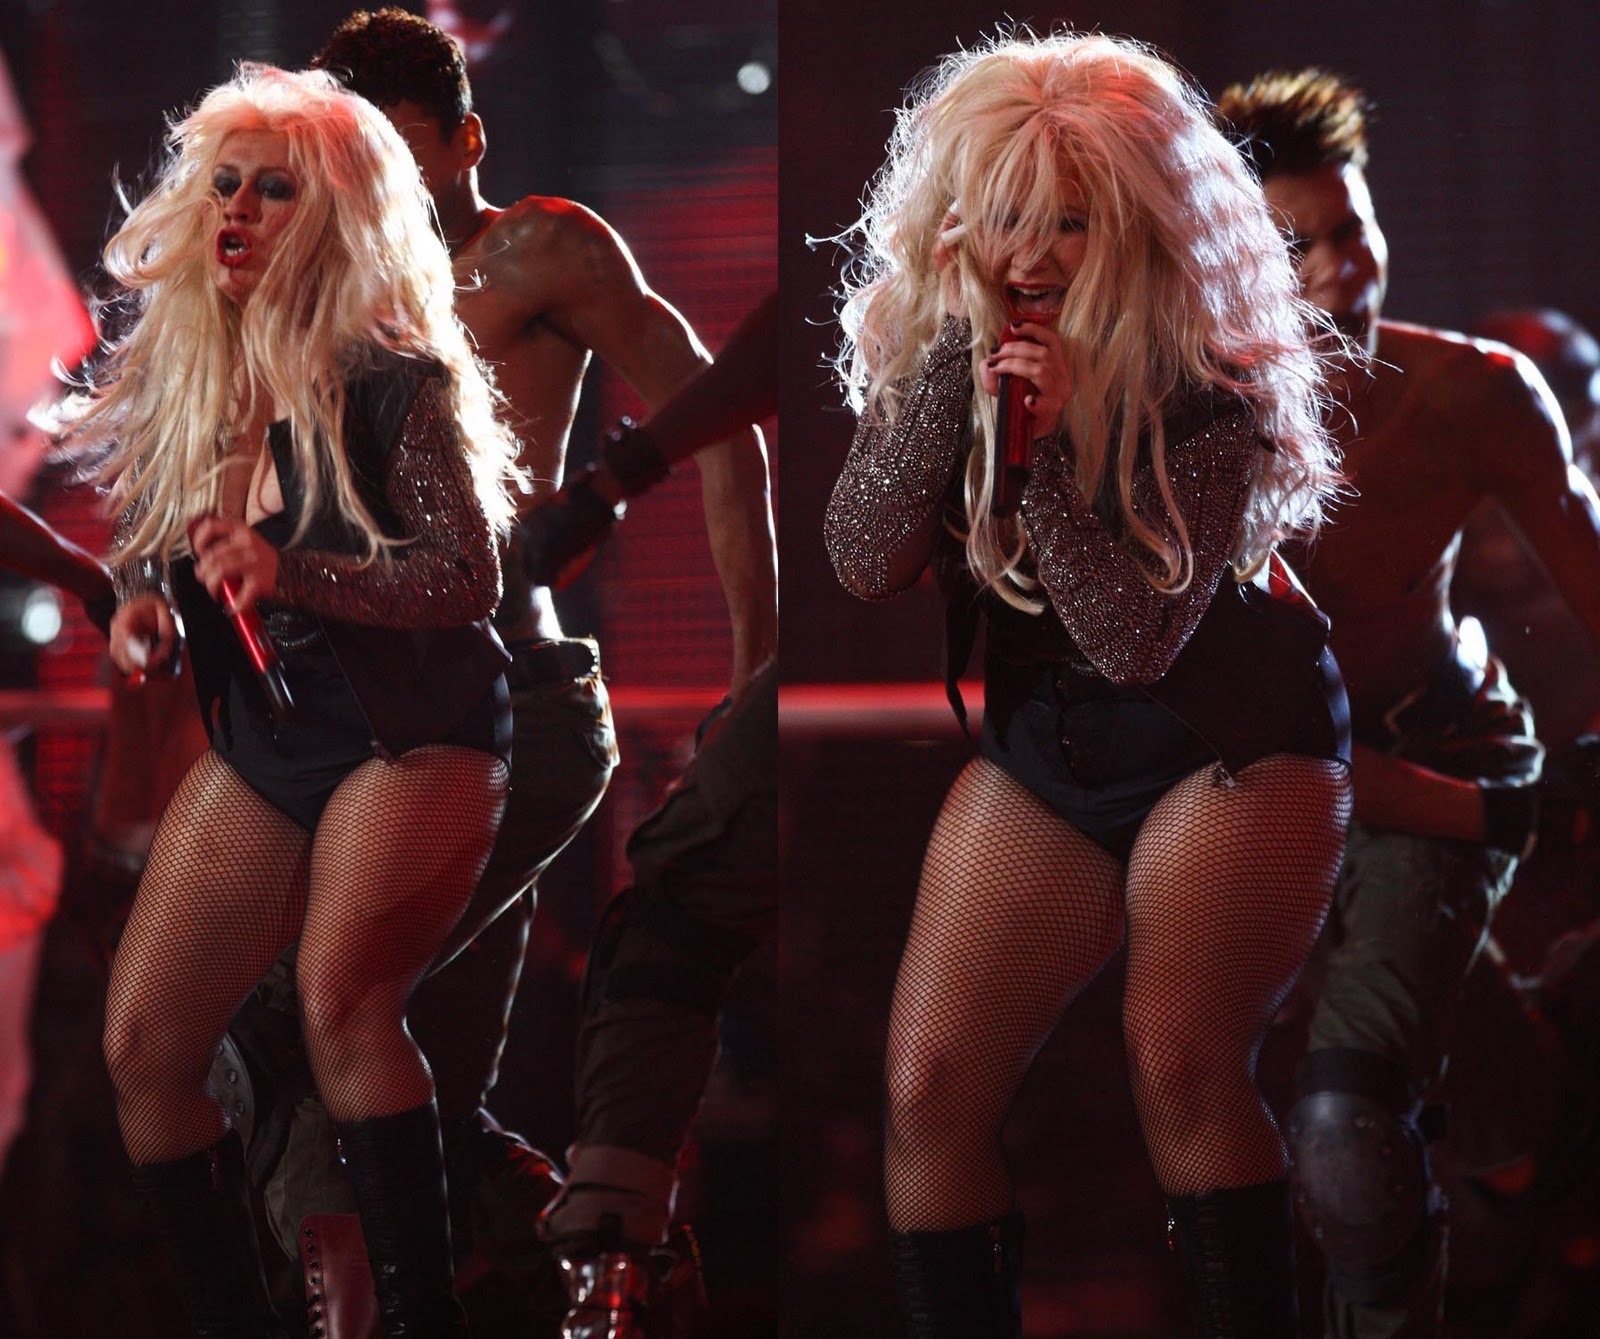 http://1.bp.blogspot.com/-wZIuX1ekc2Y/TpJuQvRREYI/AAAAAAAAAzo/HicVWVLO8ZE/s1600/FAT-Christina-Aguilera-Michael-Jackson-Tribute-Concert.jpg